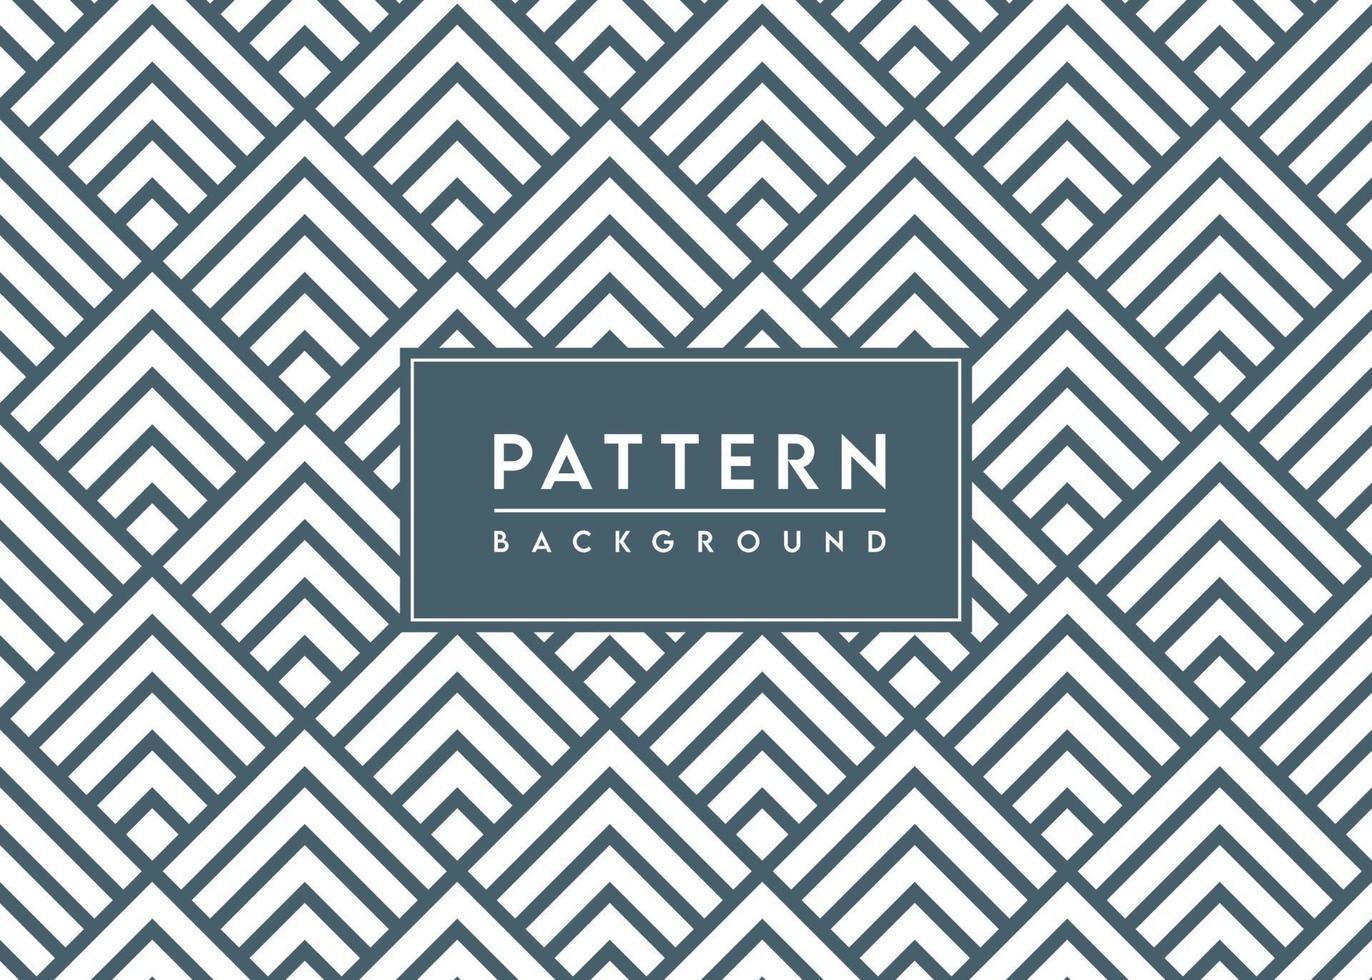 Diseño de vector de textura de fondo de patrón de rayas de diamante